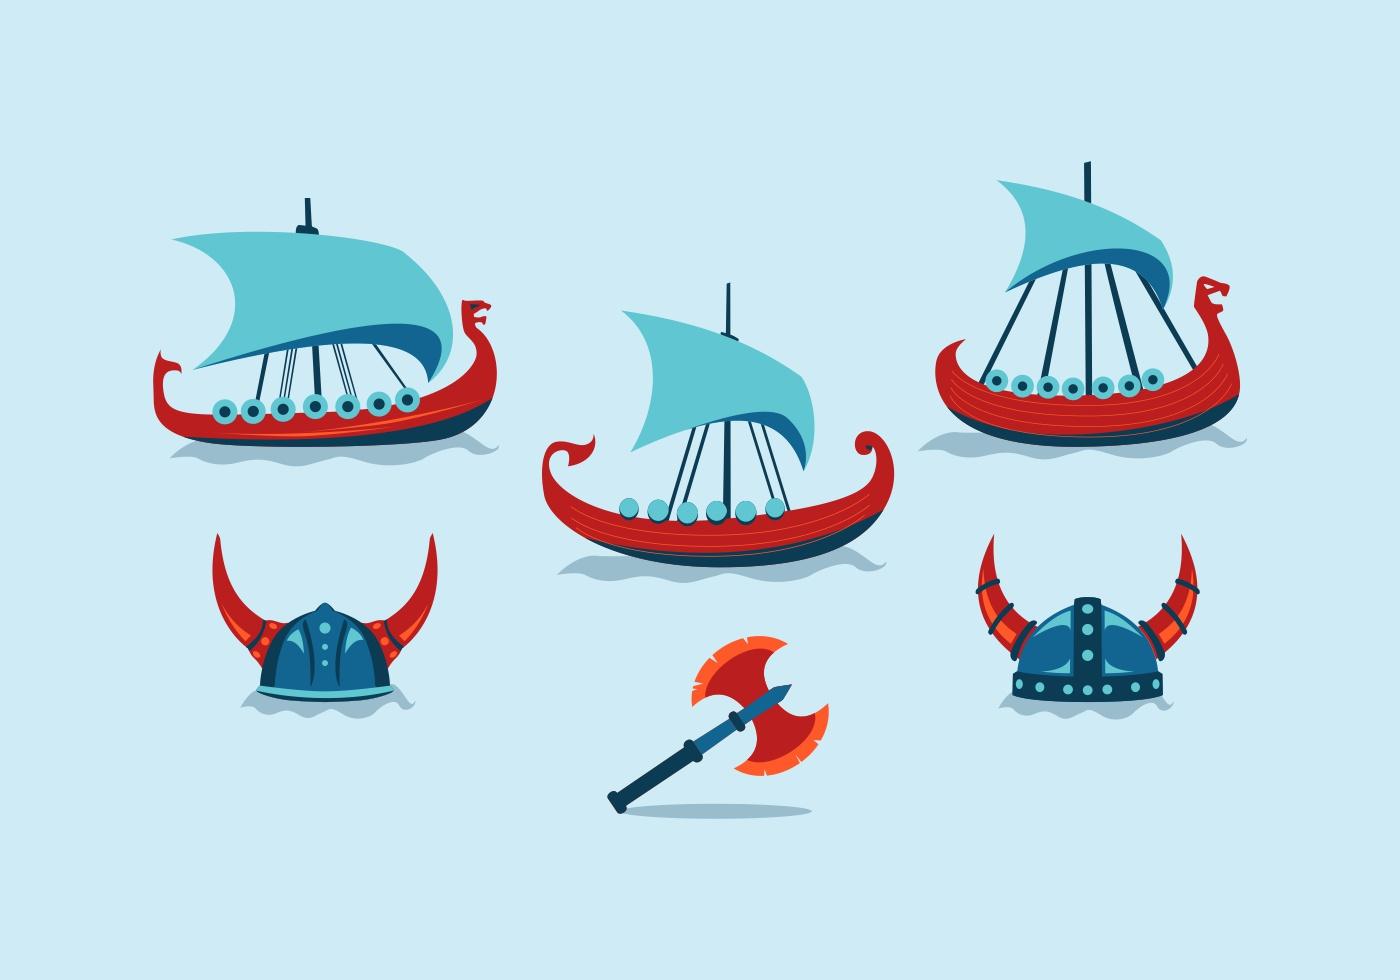 FREE VIKING SHIP VECTOR - Download Free Vectors, Clipart ...